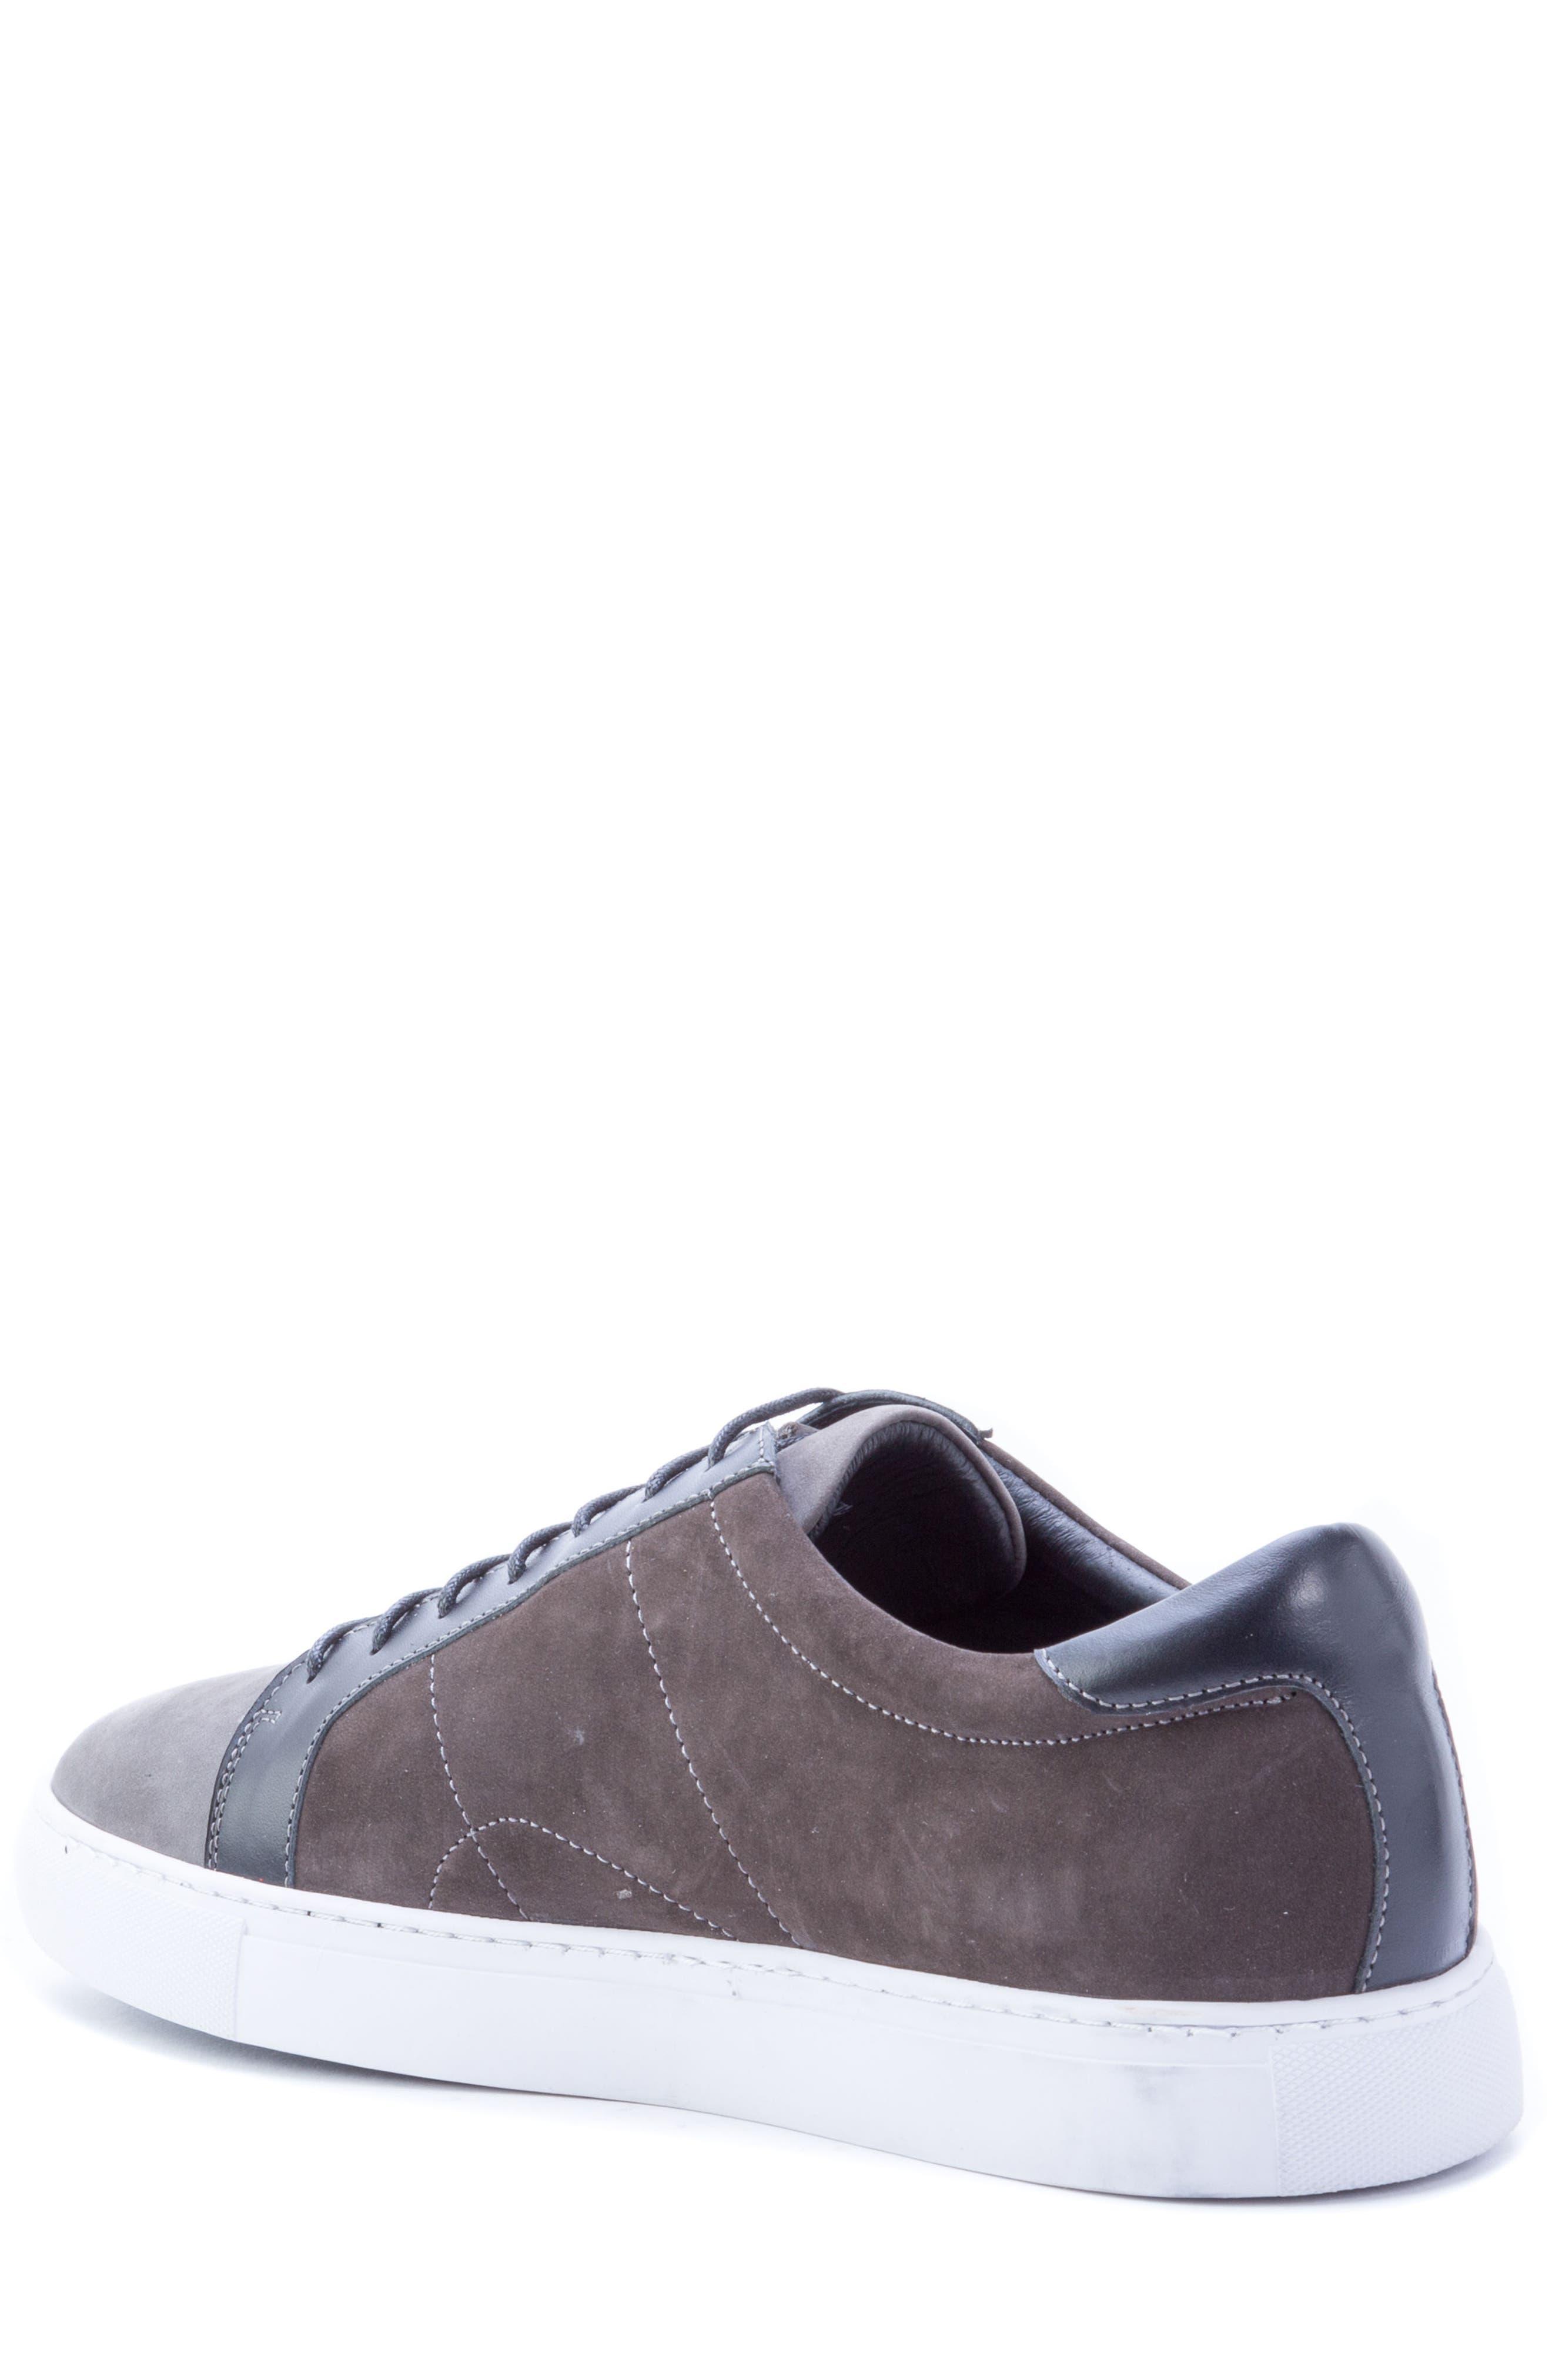 ROBERT GRAHAM, Gonzalo Low Top Sneaker, Alternate thumbnail 2, color, GREY SUEDE